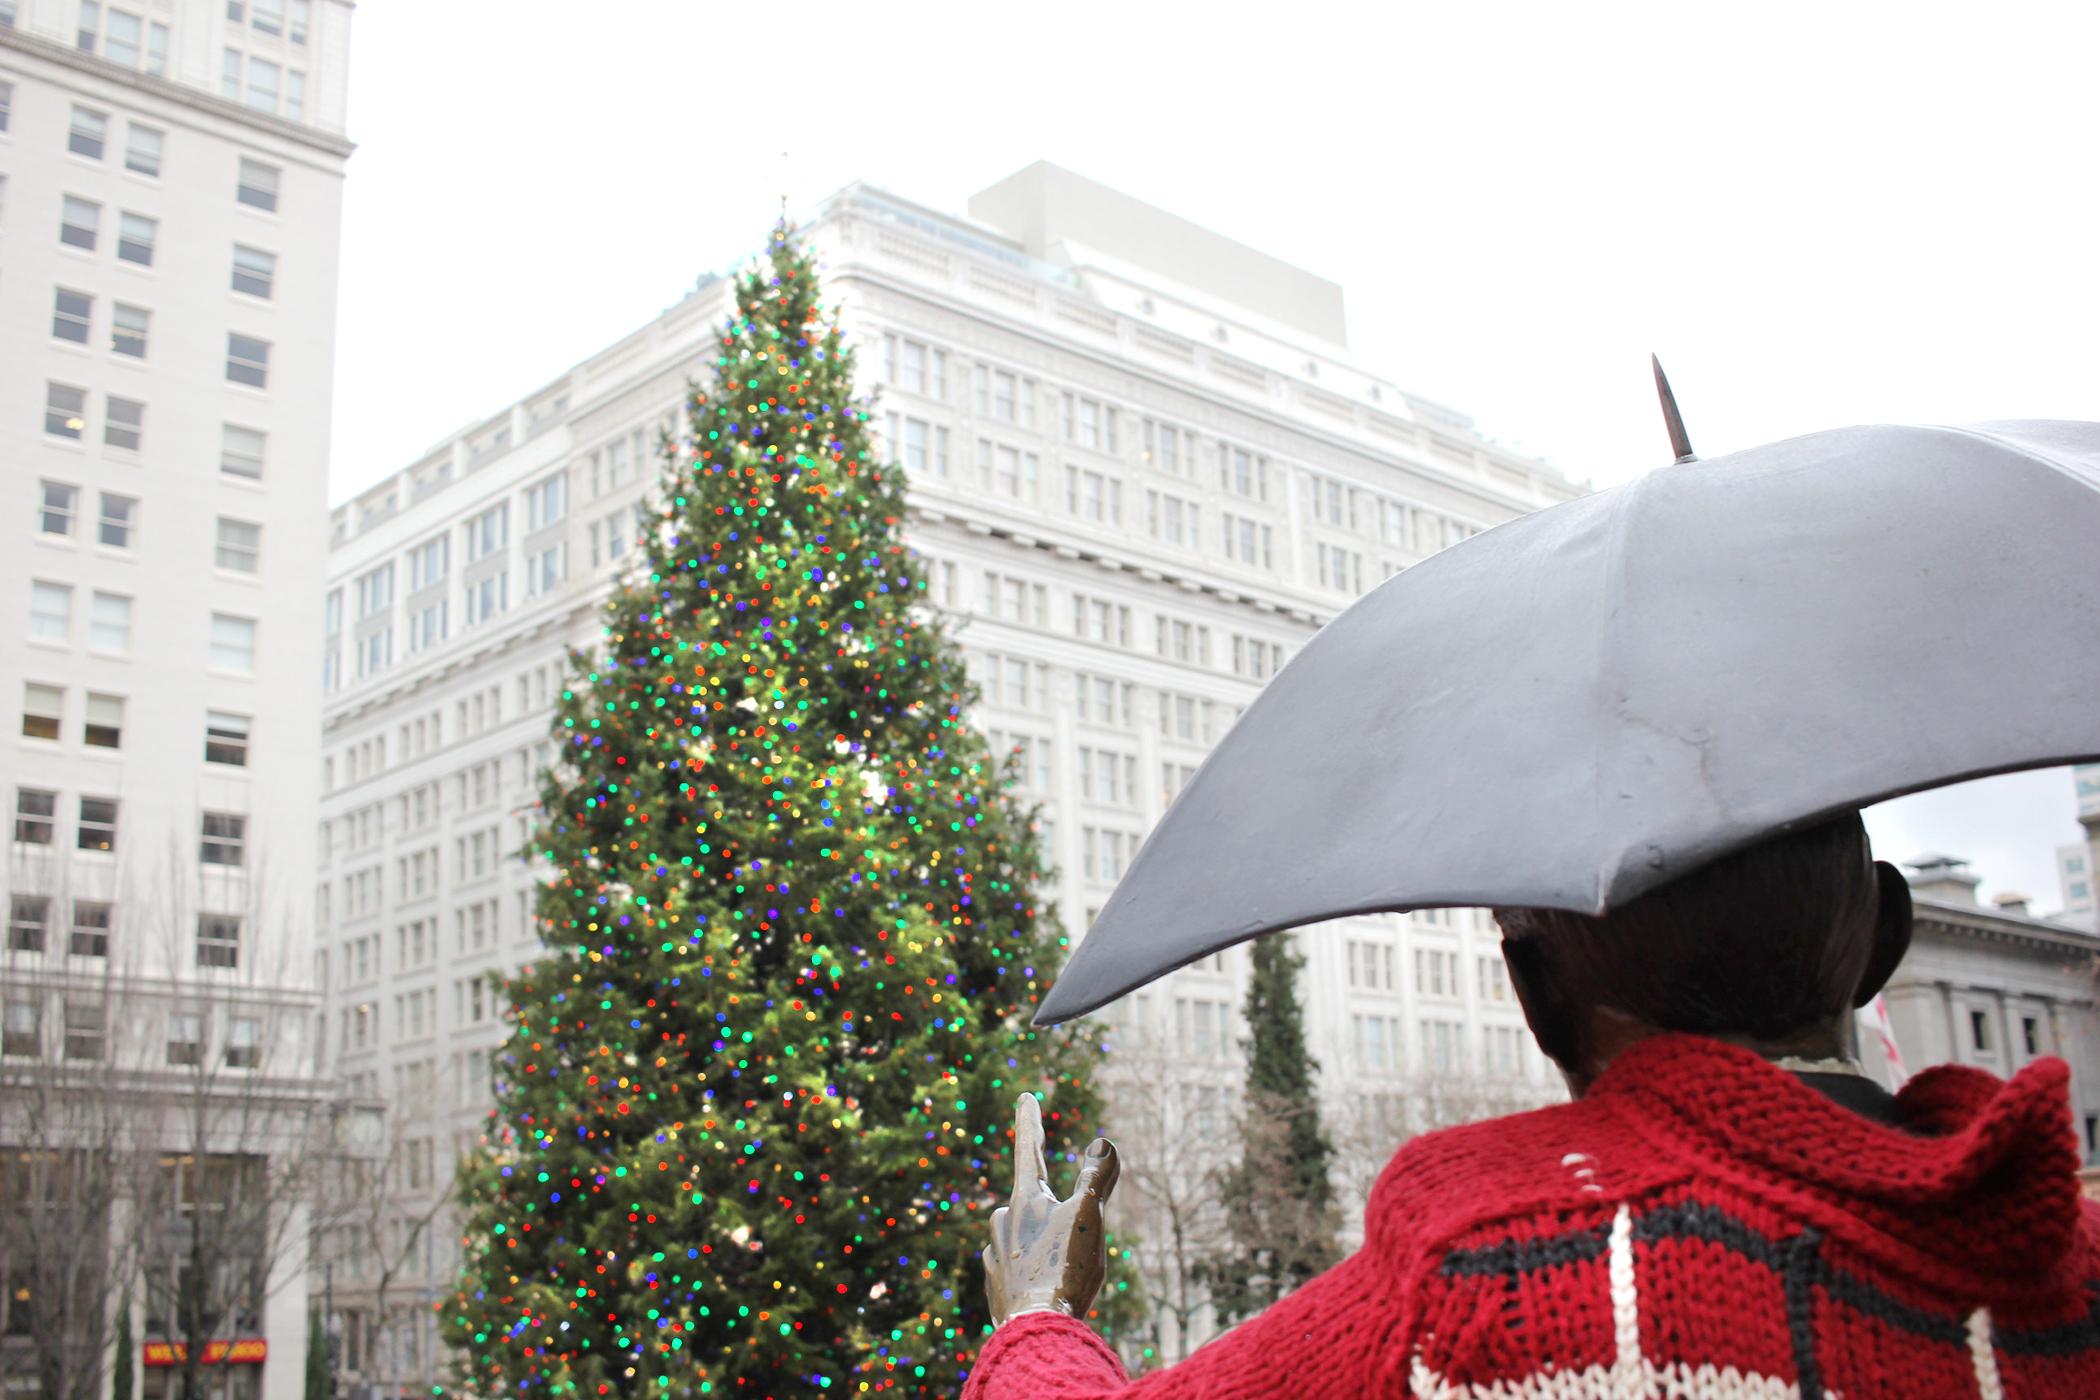 Portland Oregon Christmas Events 2020 Portland Holiday Events | The Official Guide to Portland